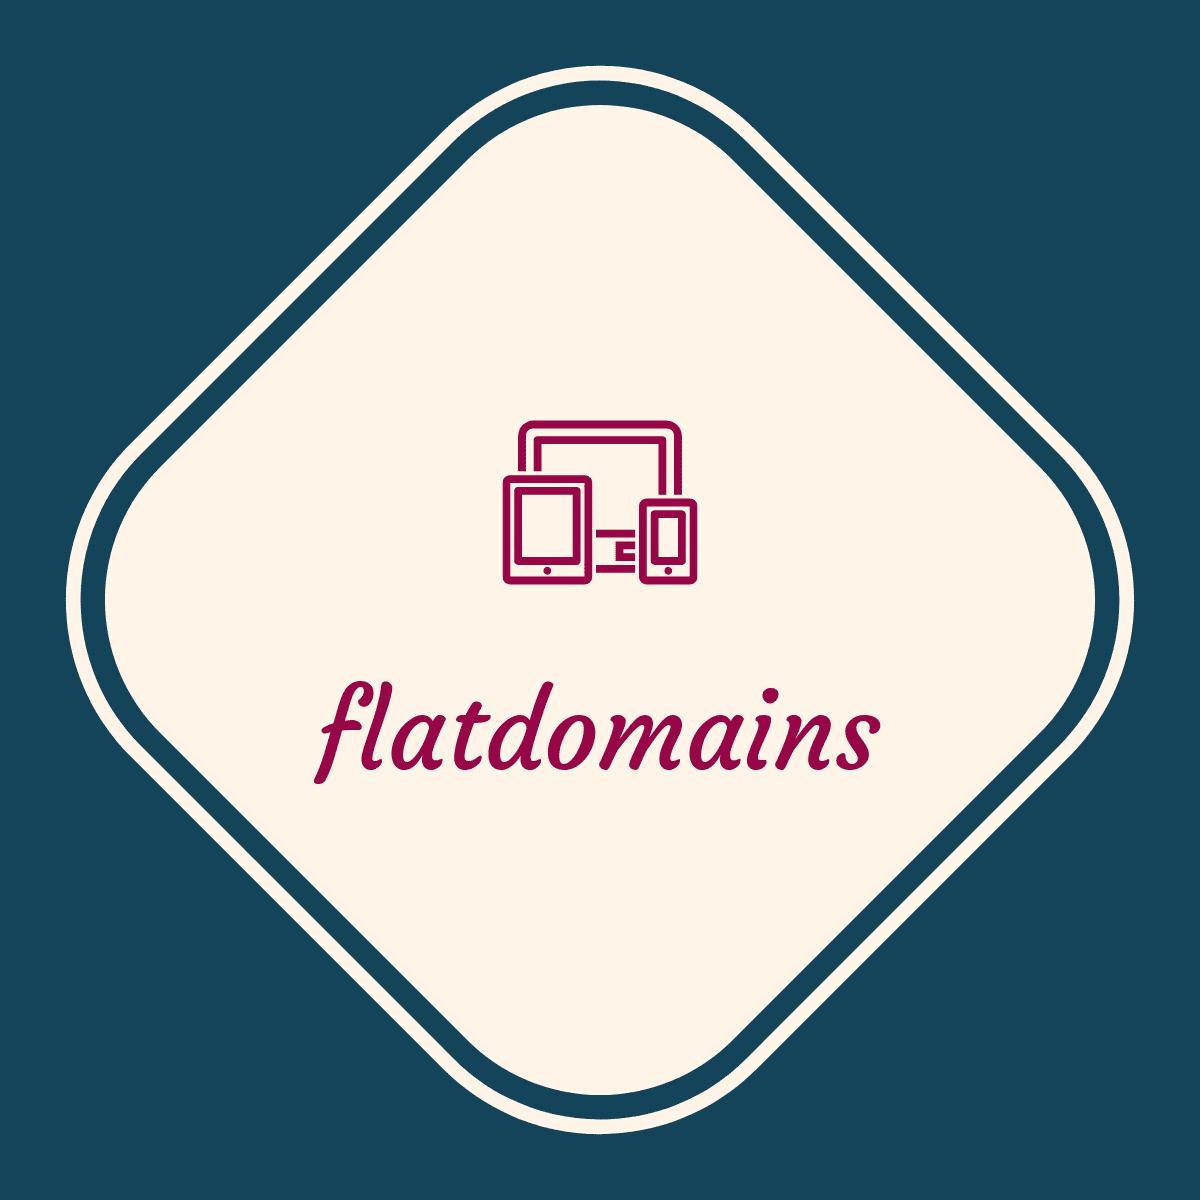 flatdomains